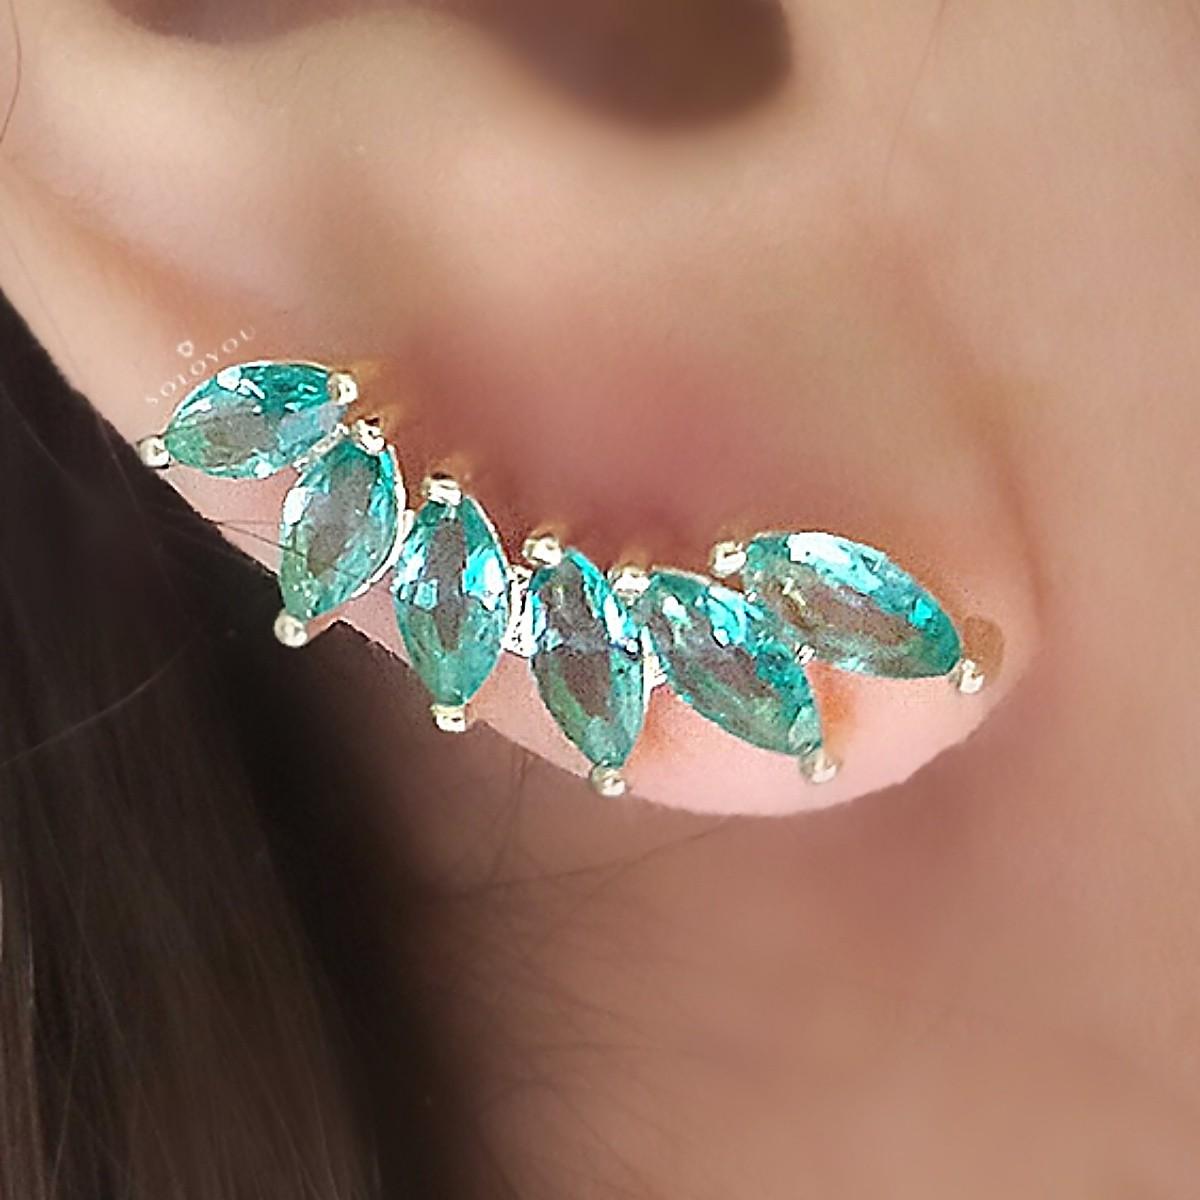 Ear Cuff Turmalina Navete Semijoia em Ouro 18K com Zircônia  - Soloyou